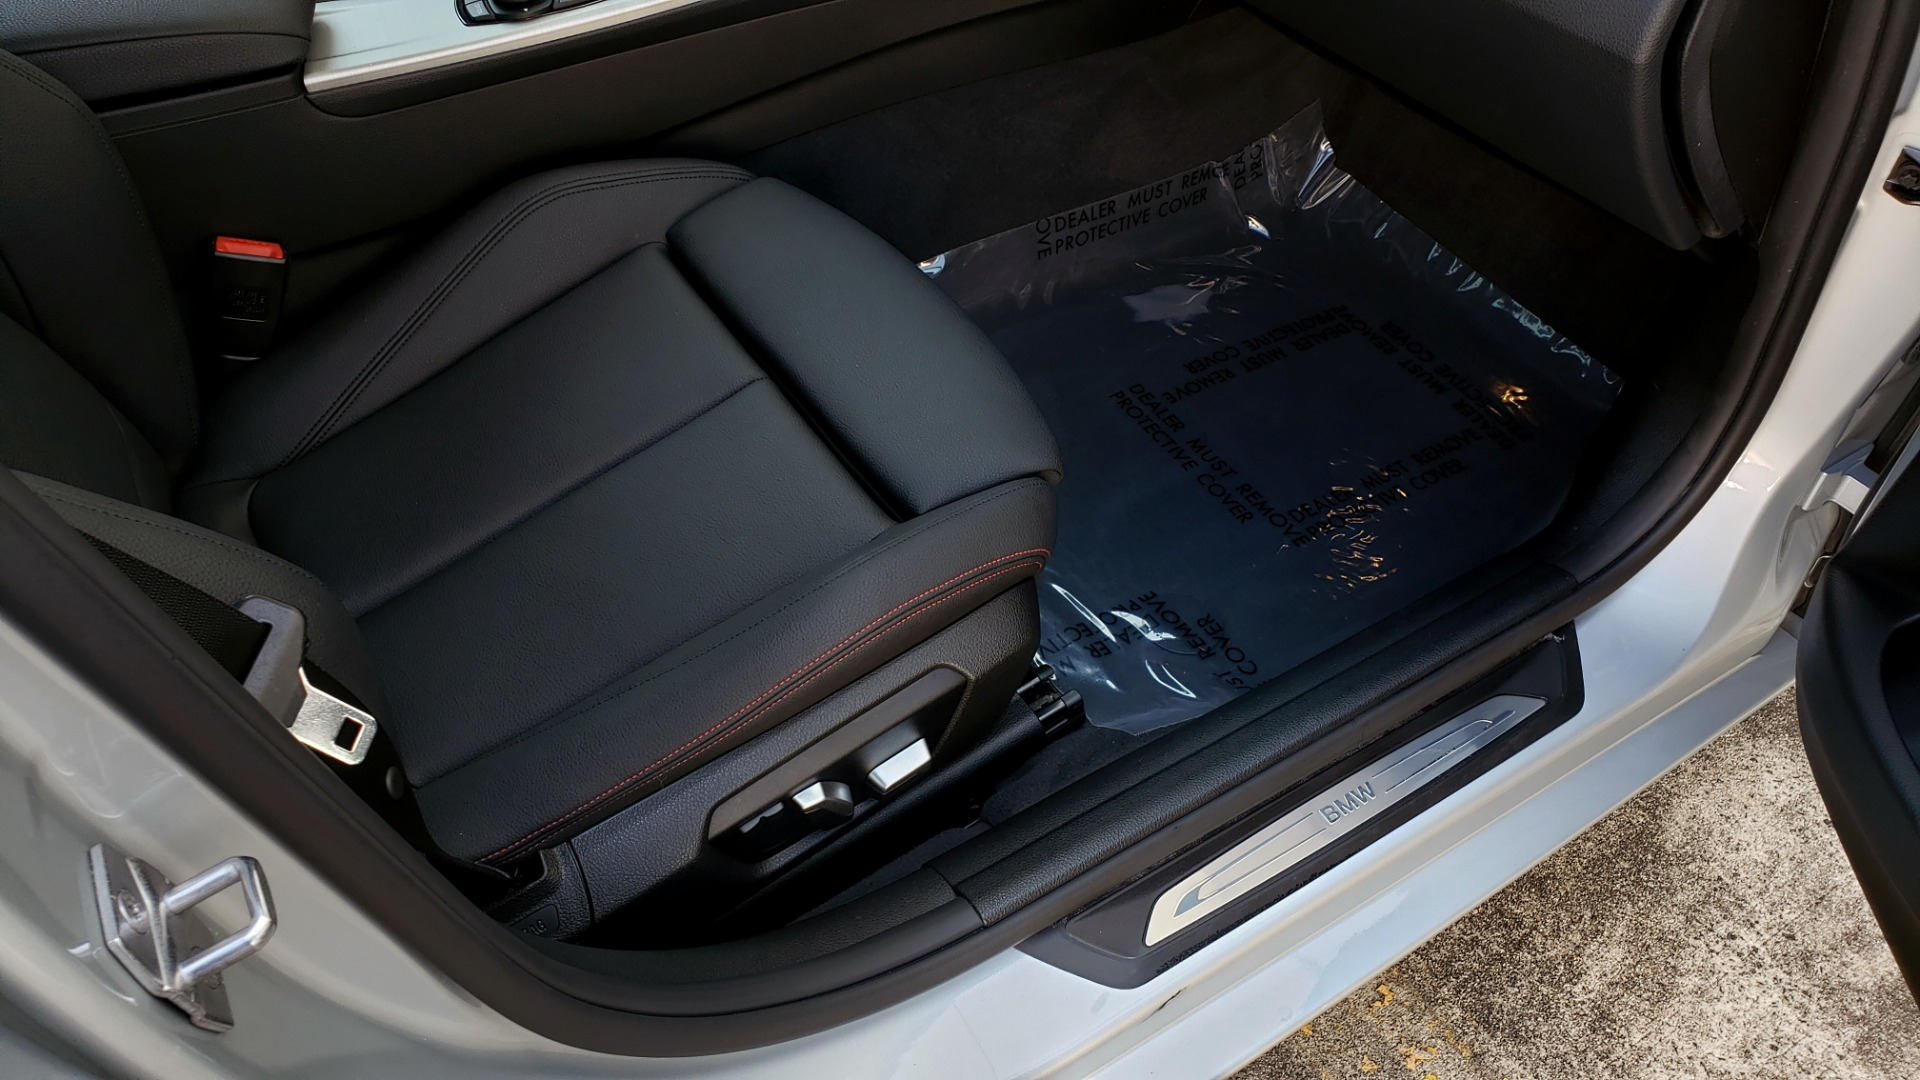 Used 2017 BMW 3 SERIES 330I SPORT SEDAN / DRVR ASST PKG / SUNROOF / REARVIEW for sale Sold at Formula Imports in Charlotte NC 28227 64